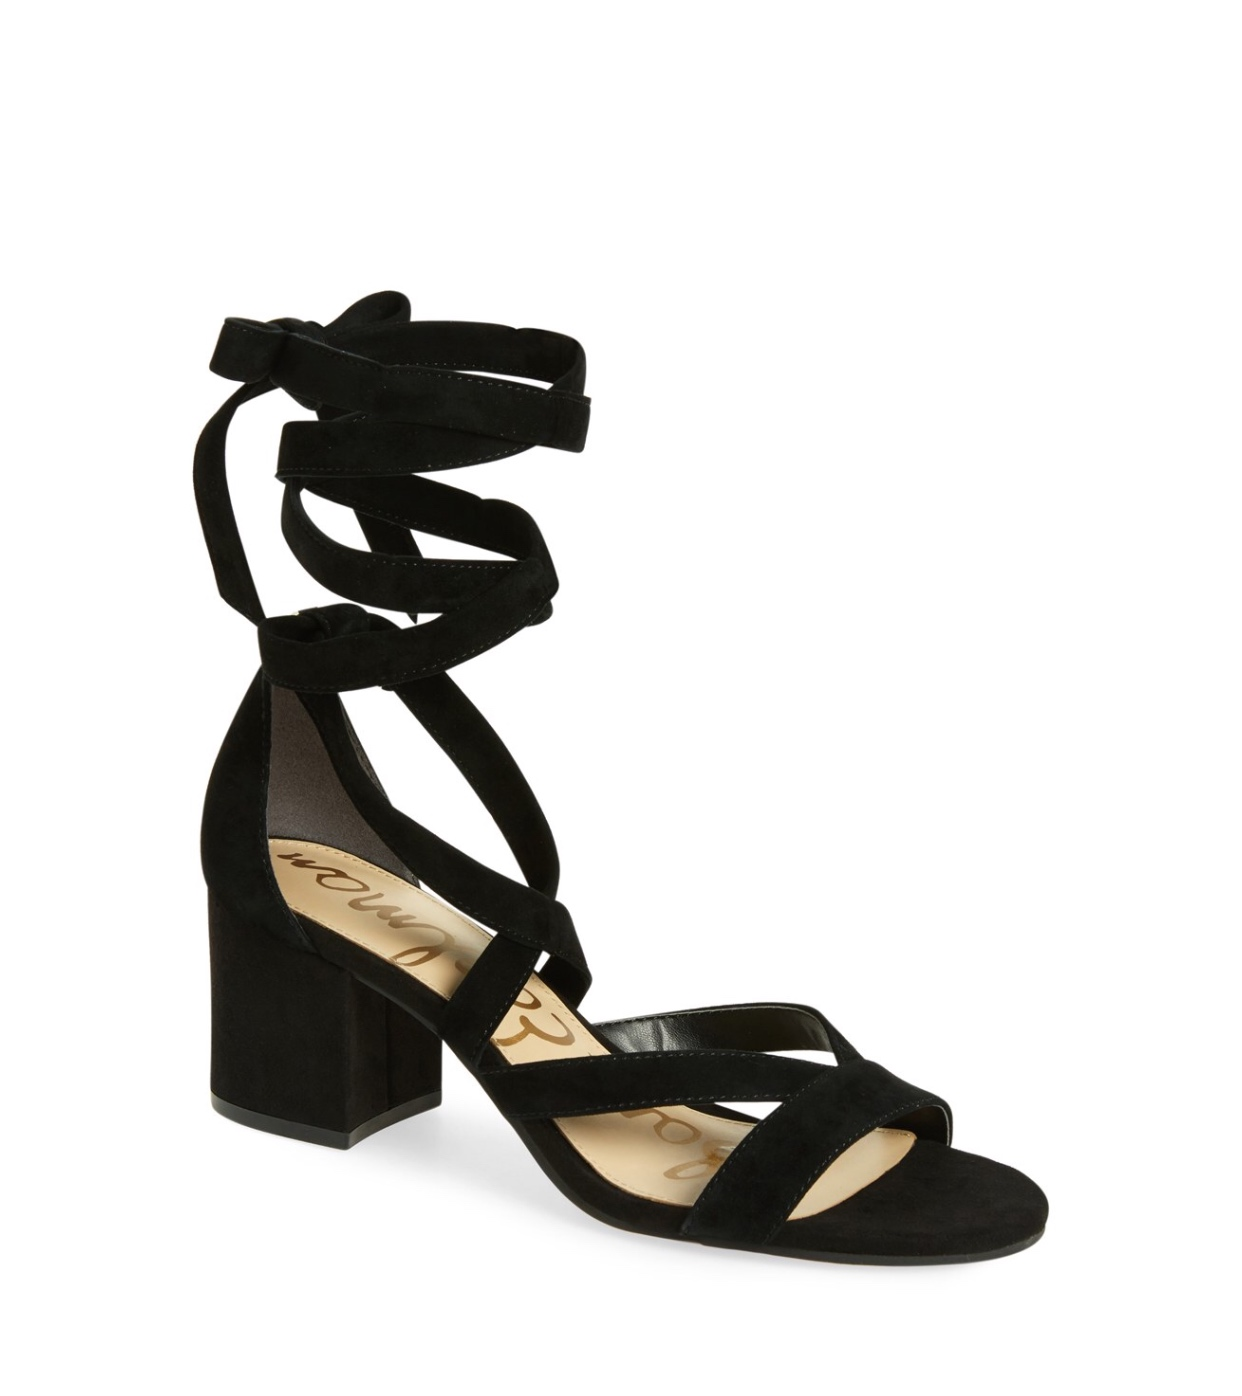 6eb2ce433a7 Nordstrom  Sheri Sandal SAM EDELMAN - Elevated Style